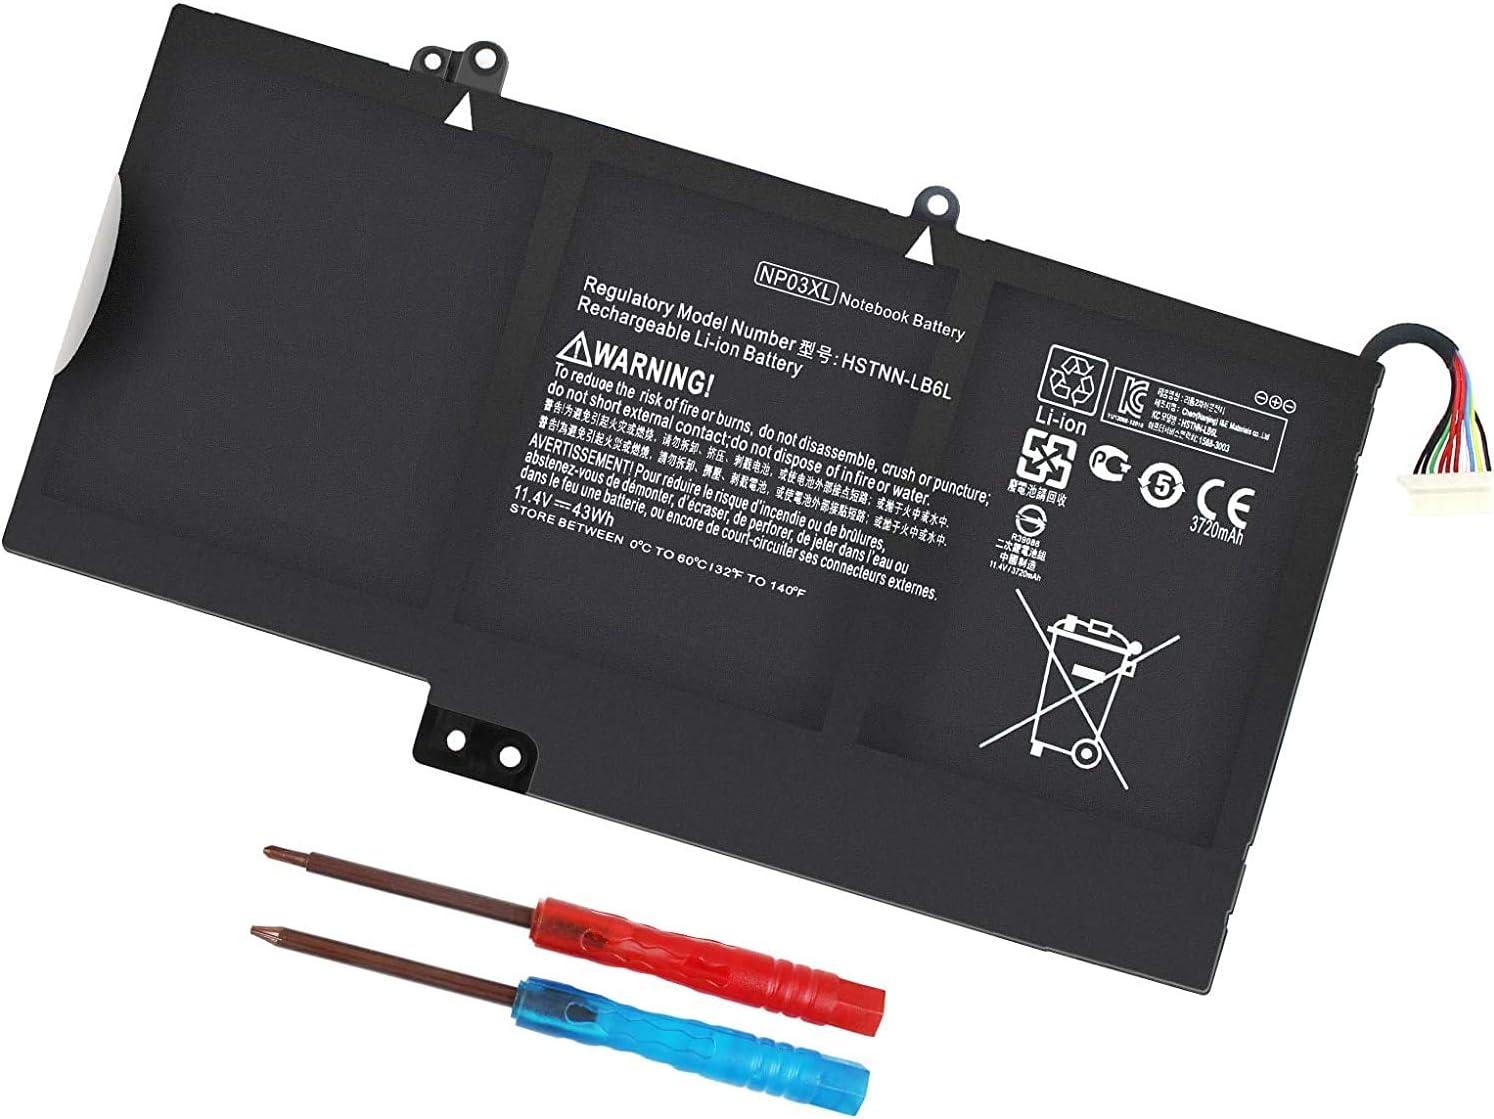 NP03XL 761230-005 Laptop Battery for HP Envy X360 15-U010DX 15-U011DX 15-U110DX 15-U111DX 15-U483CL 15-U493CL 15T-U100, Pavilion X360 13-A010DX 13-A012DX 13-A013CL 13-A110DX 13-A113CL HSTNN-LB6L